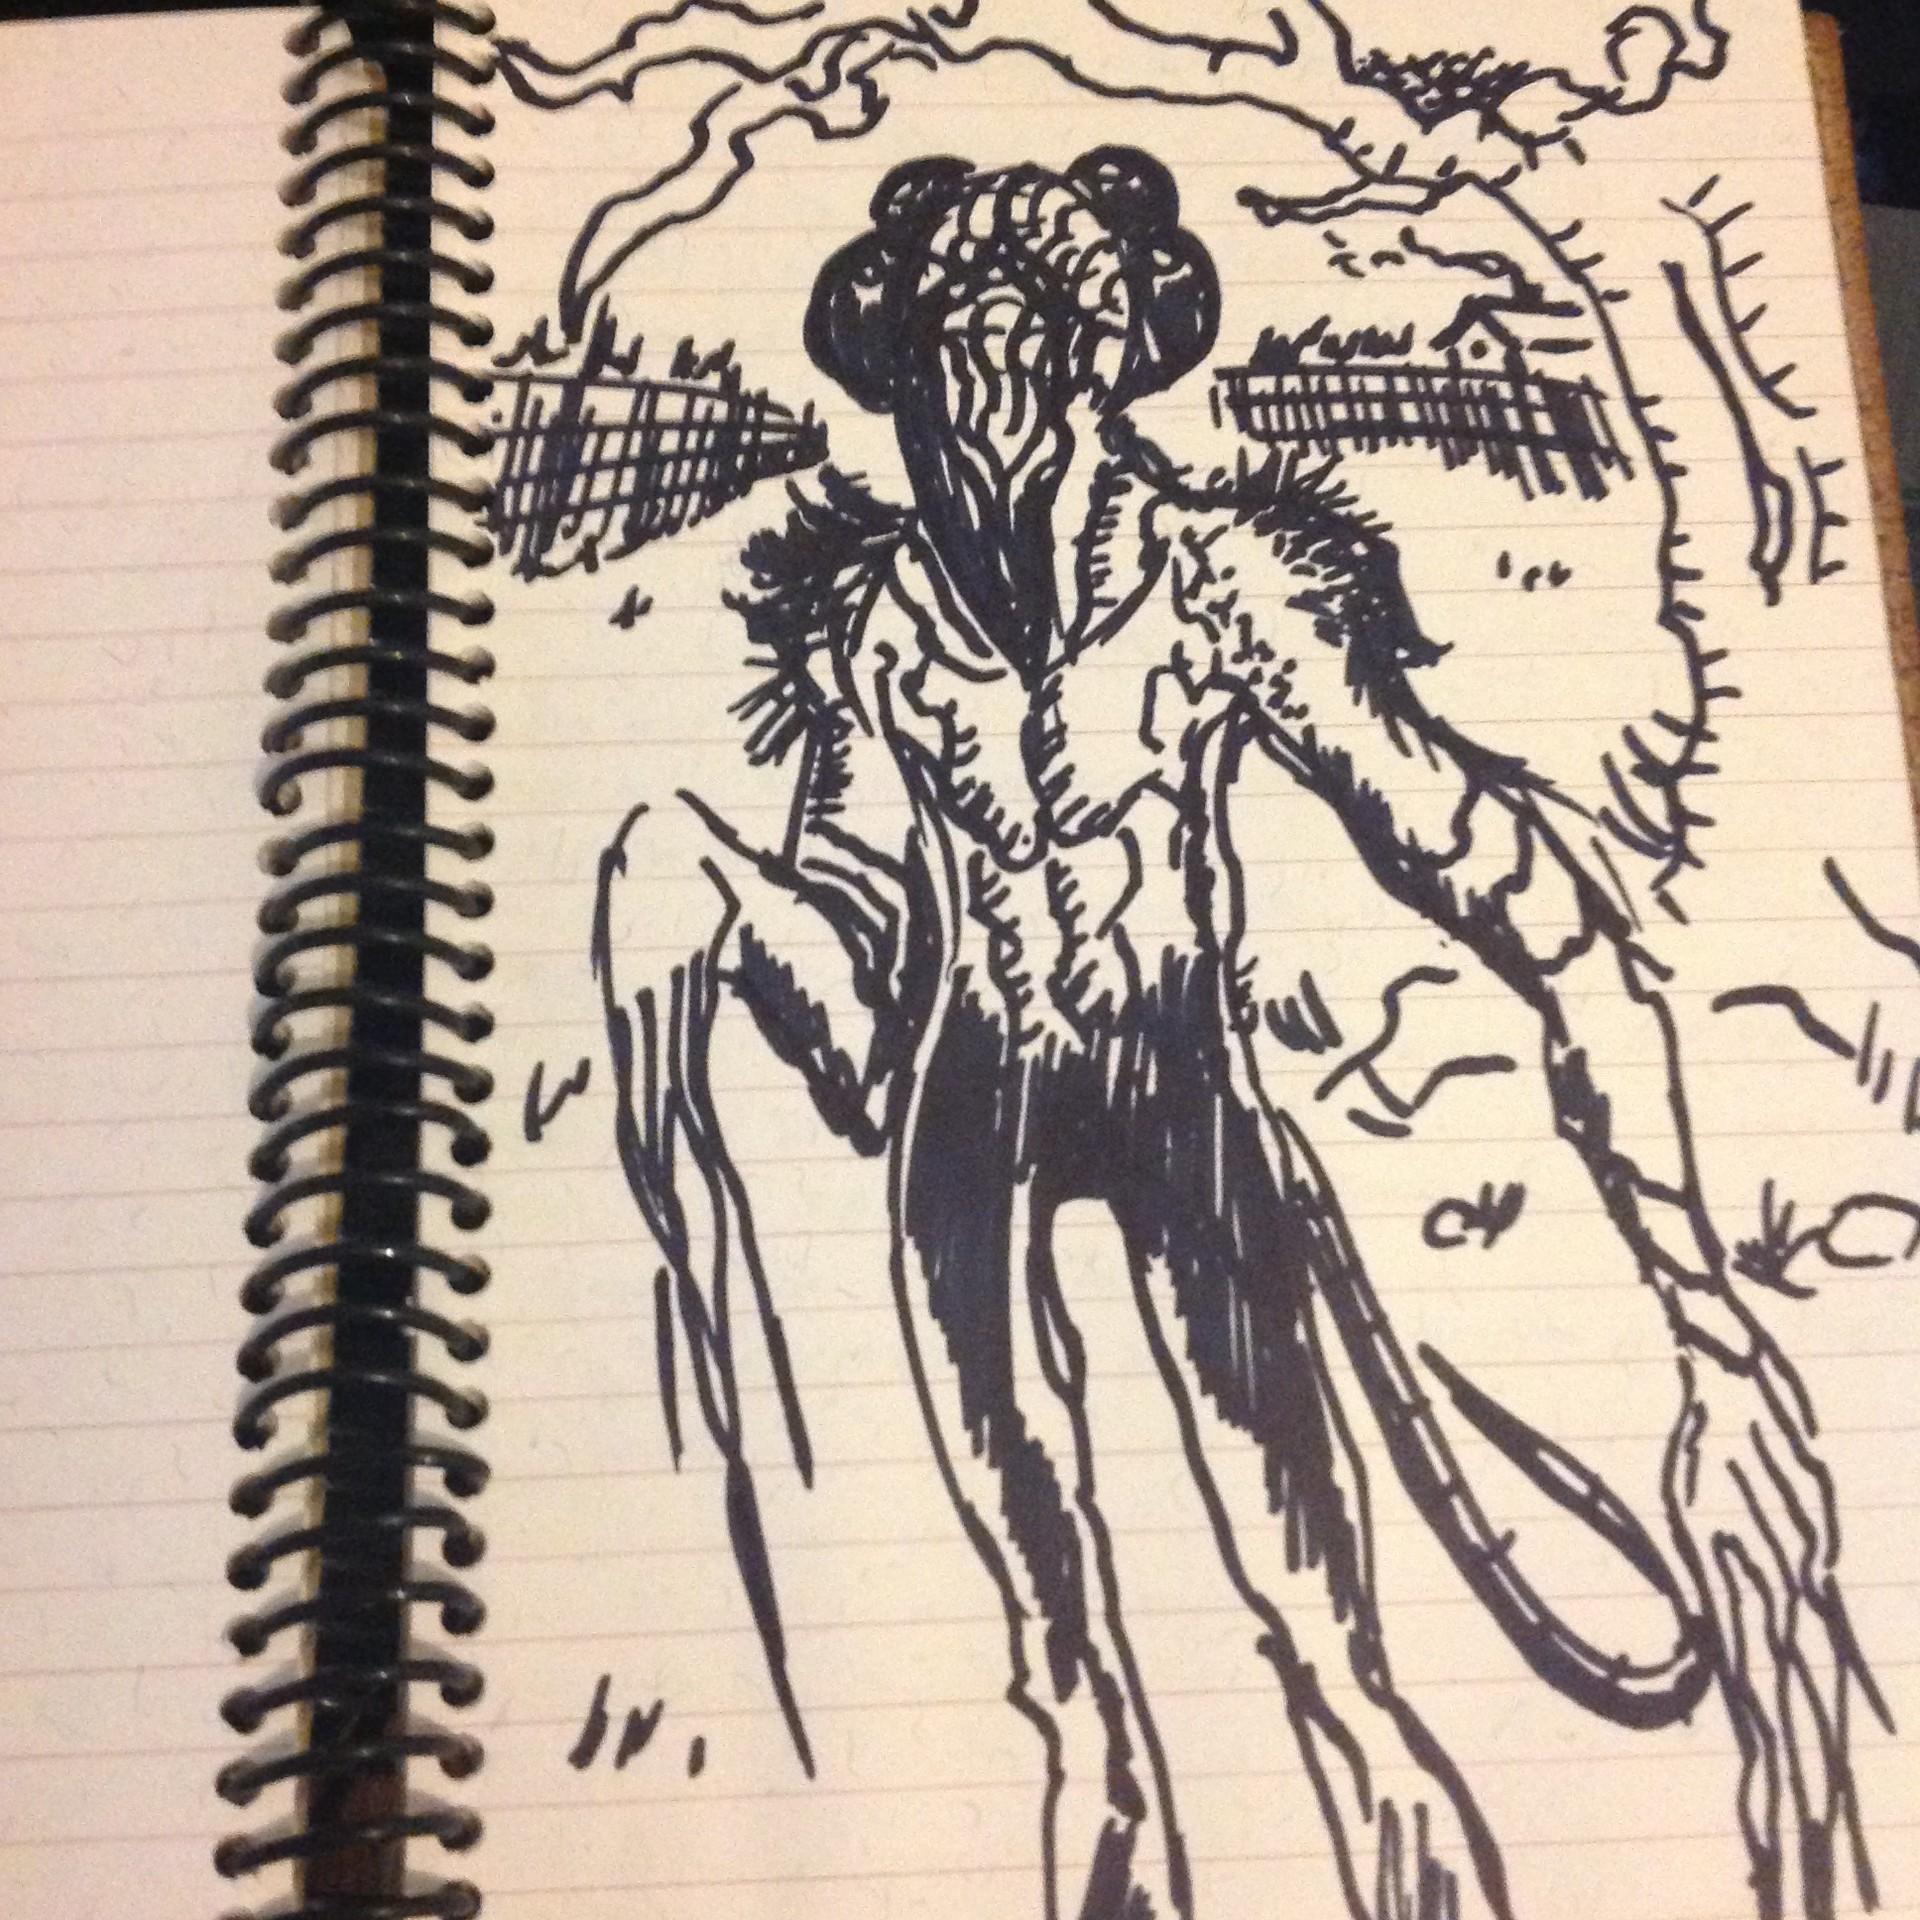 Artstation ancient sketchbook horror themed drawings sebakuryu c s p c